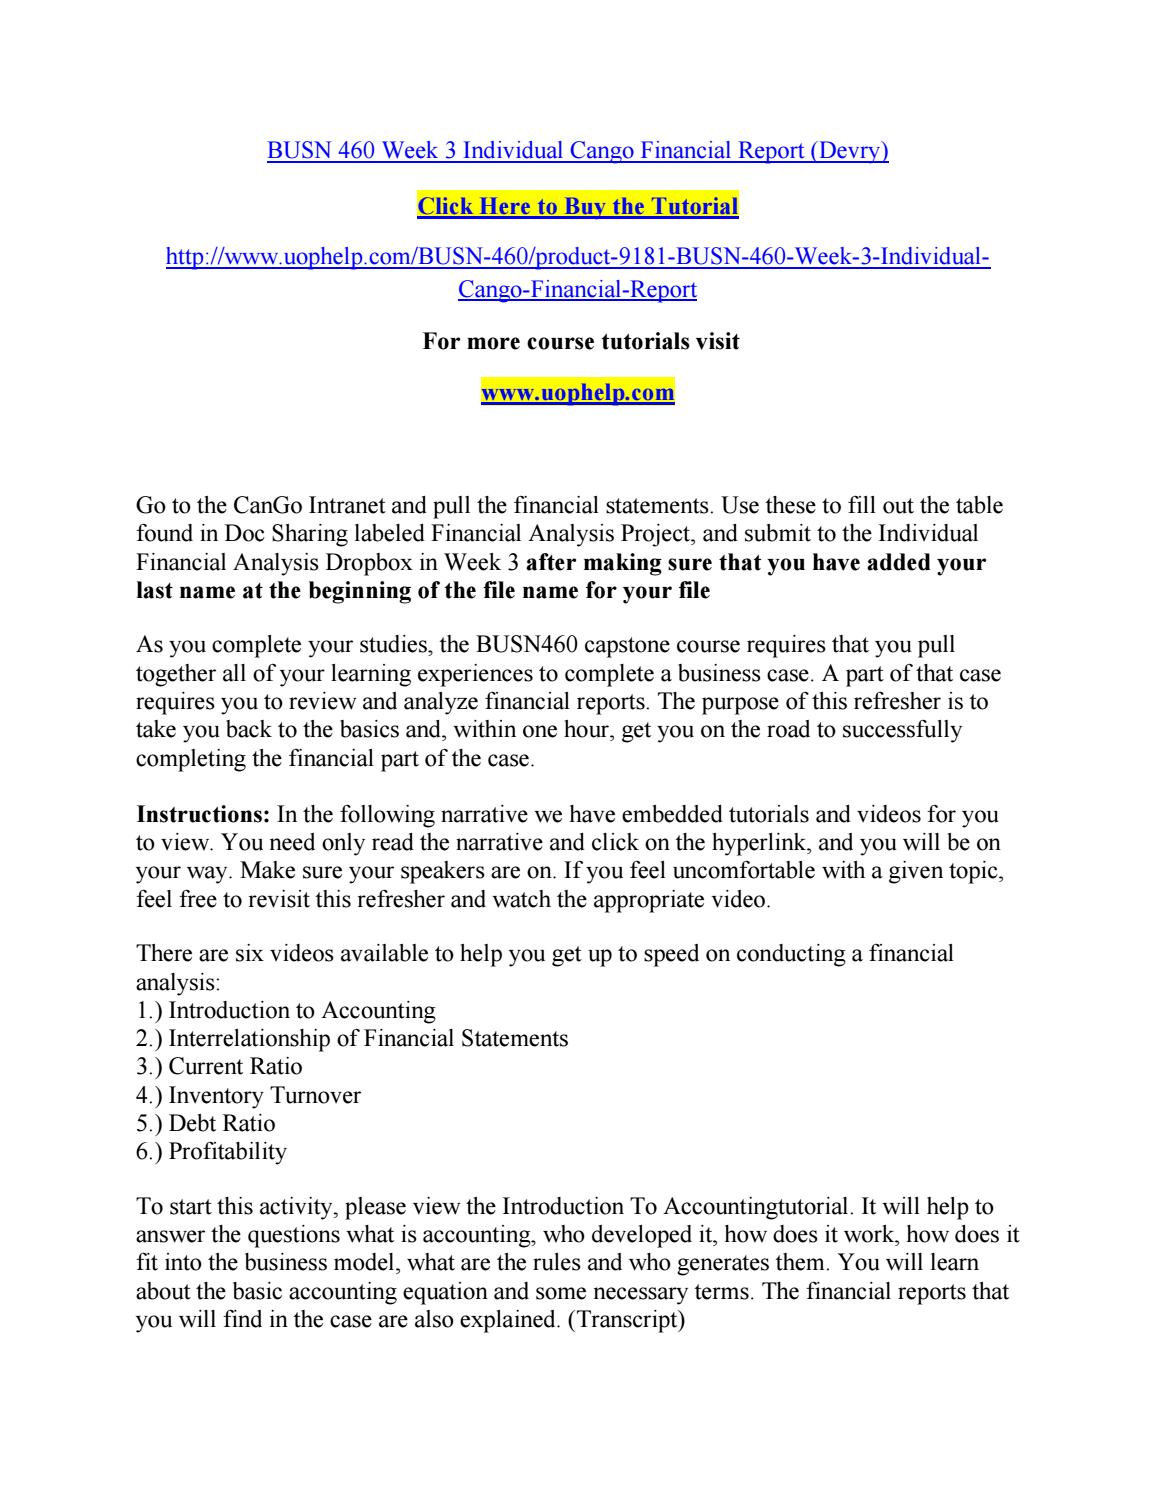 ACC 206 Week 2 DQ 1 Financial Statement Analysis